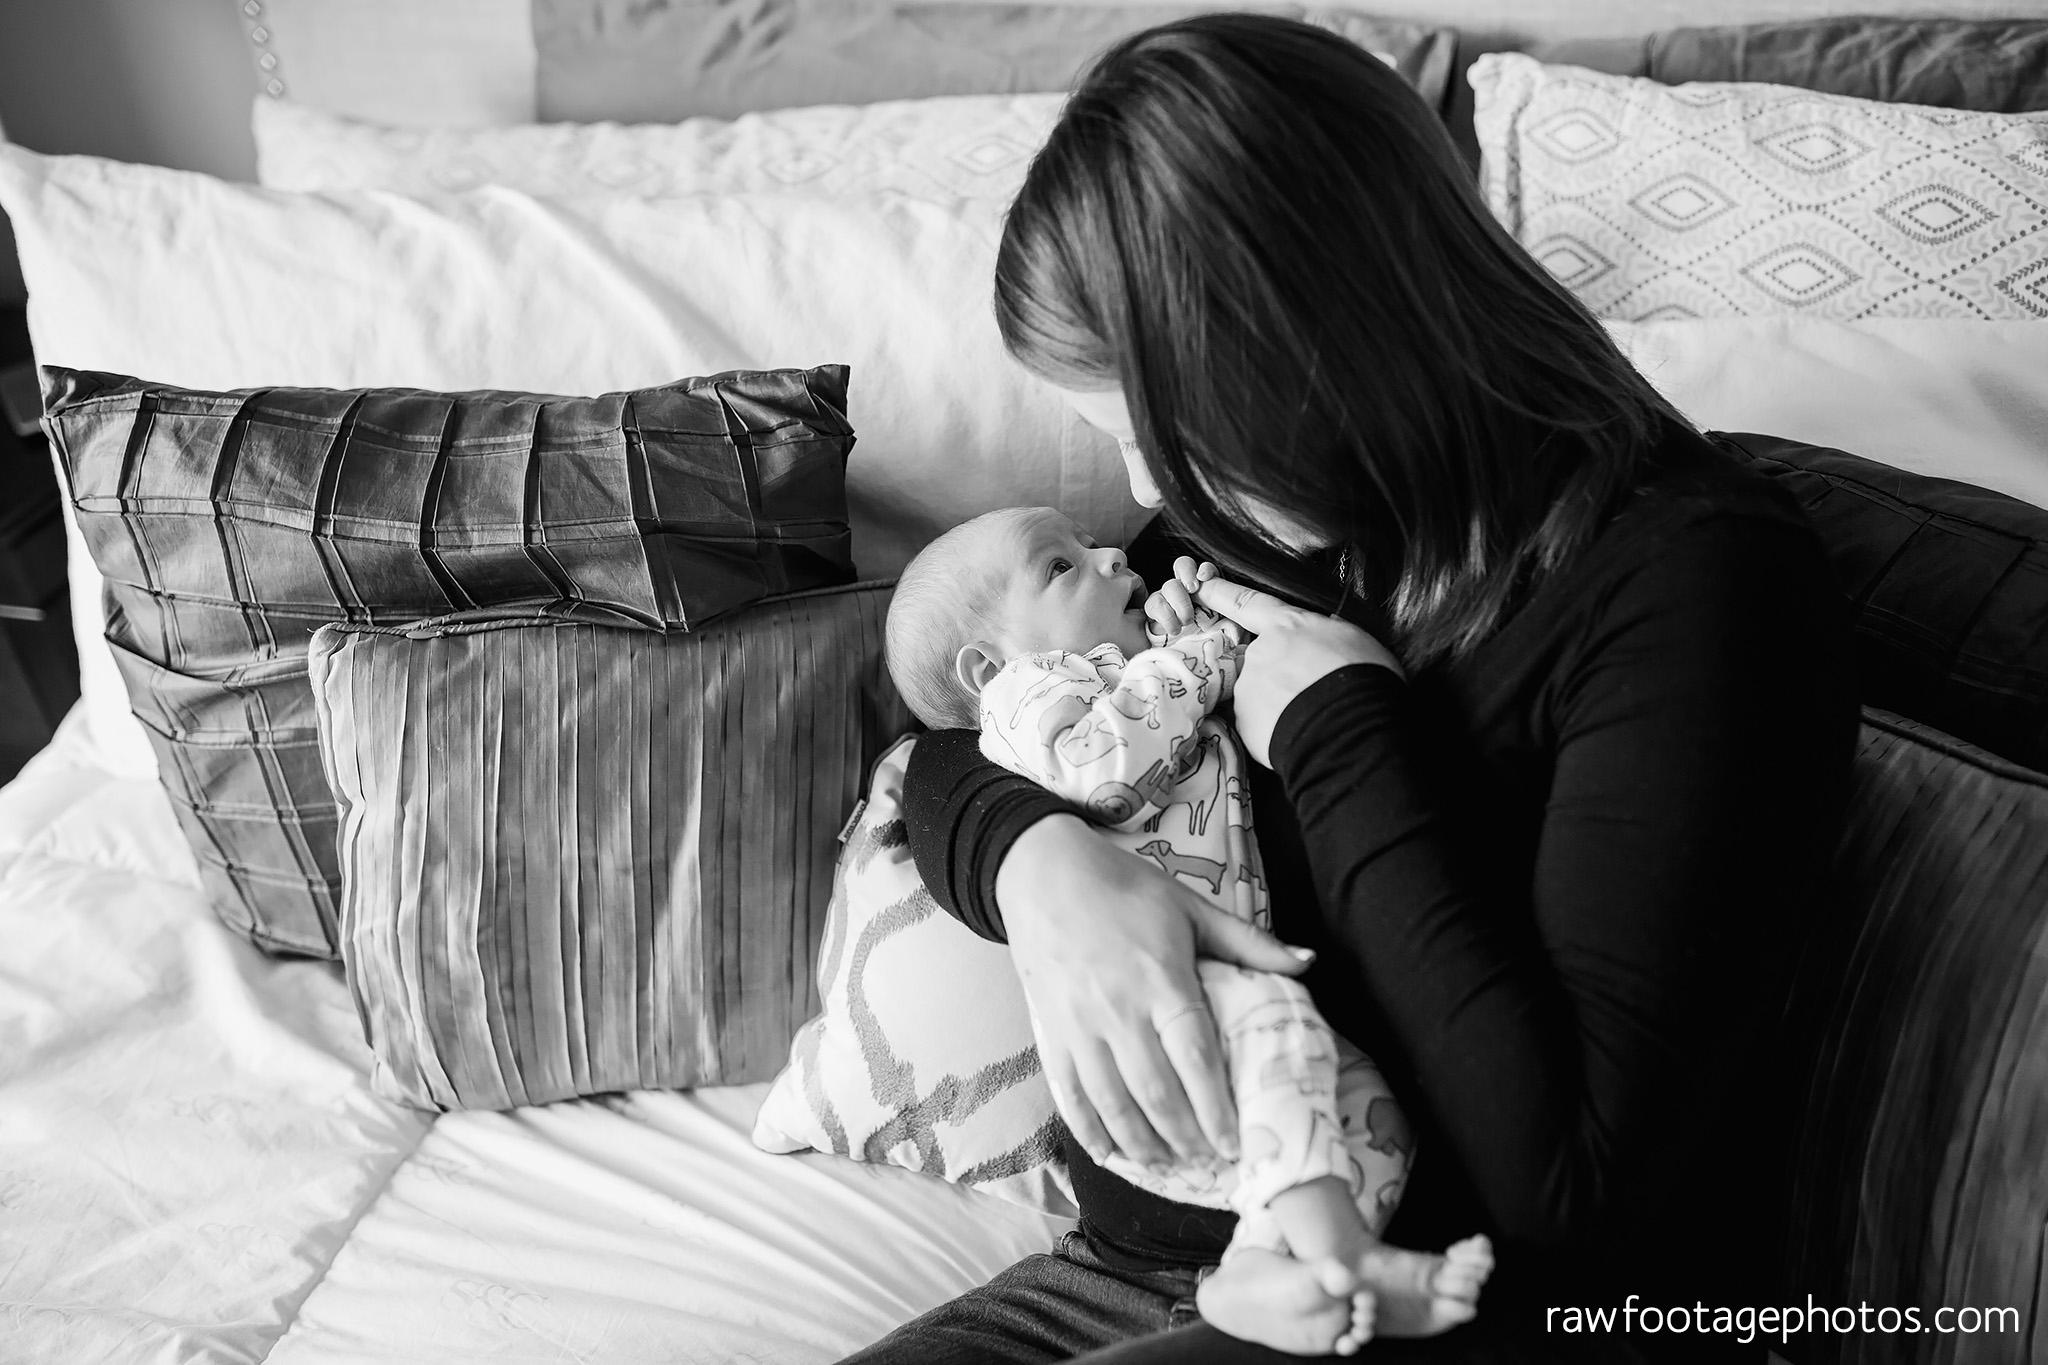 london_ontario_newborn_lifestyle_photographer-baby_nate-raw_footage_photography017.jpg